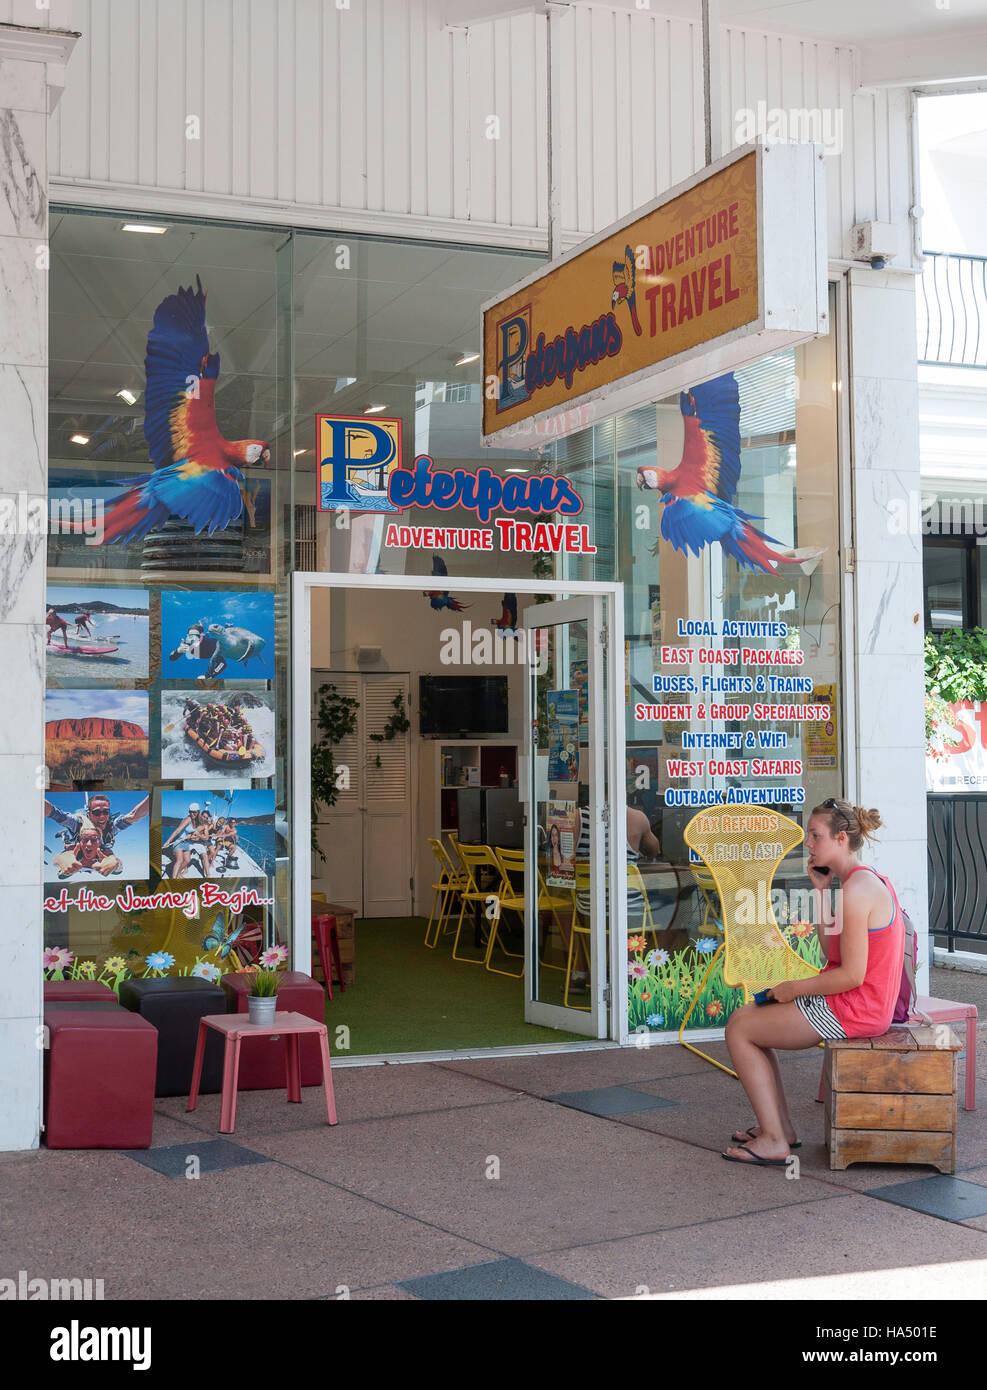 Peterpans Adventure Travel Agent, Orchid Avenue, Surfers Paradise, City of Gold Coast, Queensland, Australia - Stock Image